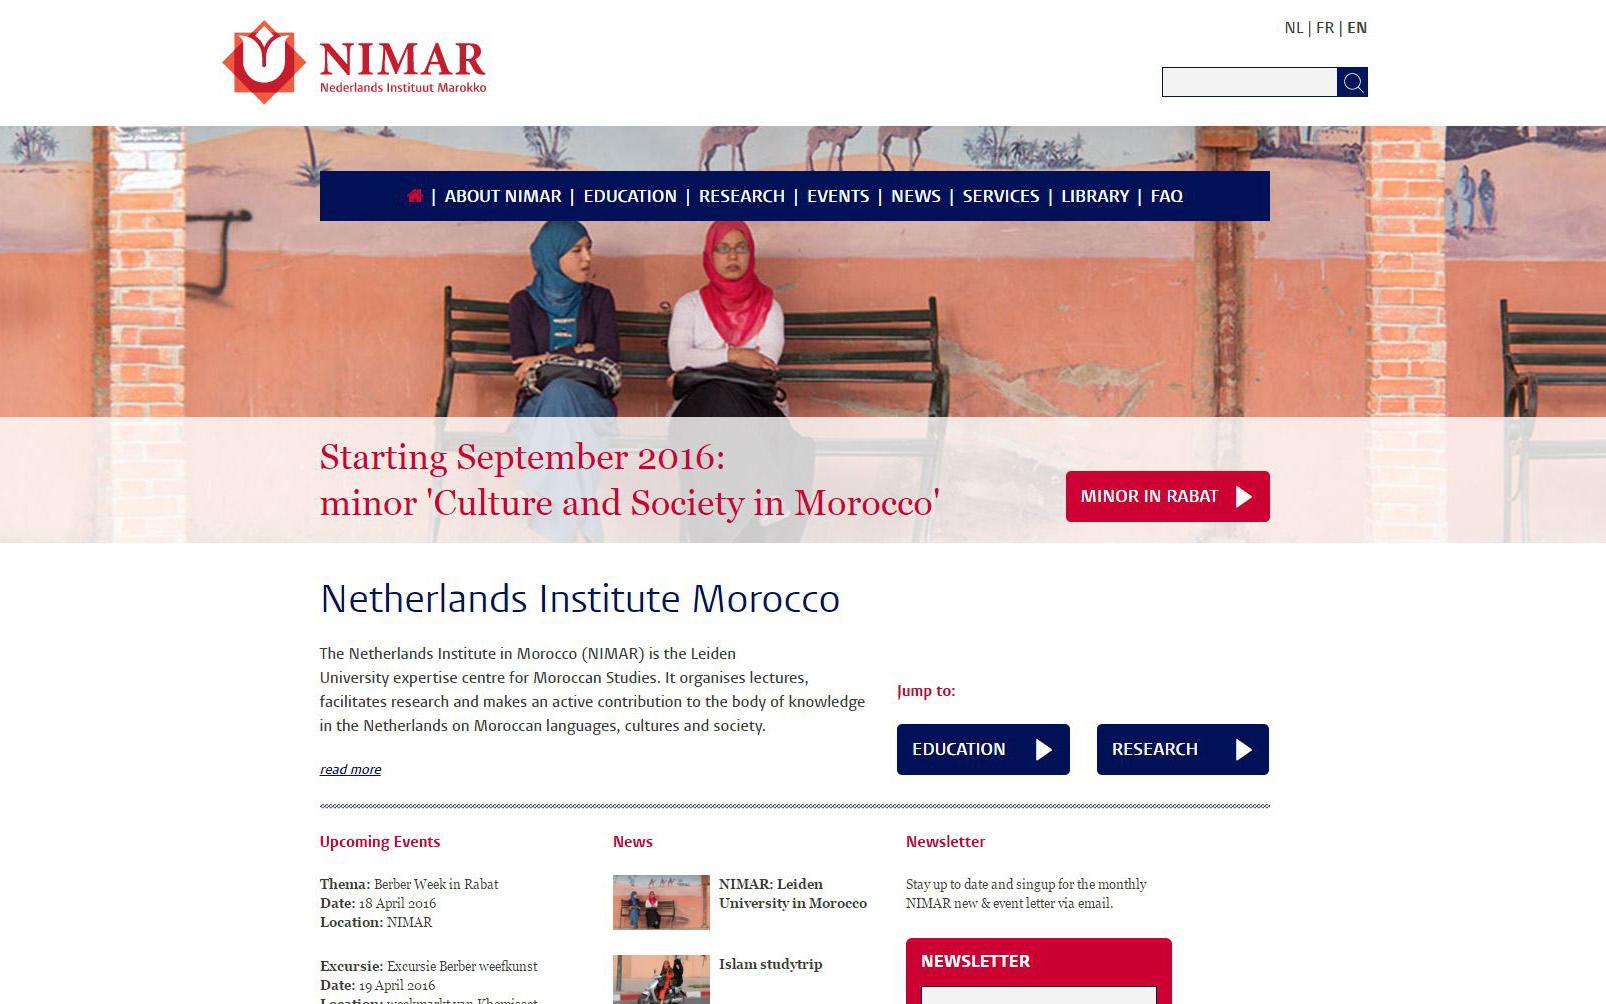 netherlands institute morocco (nimar) - leiden university